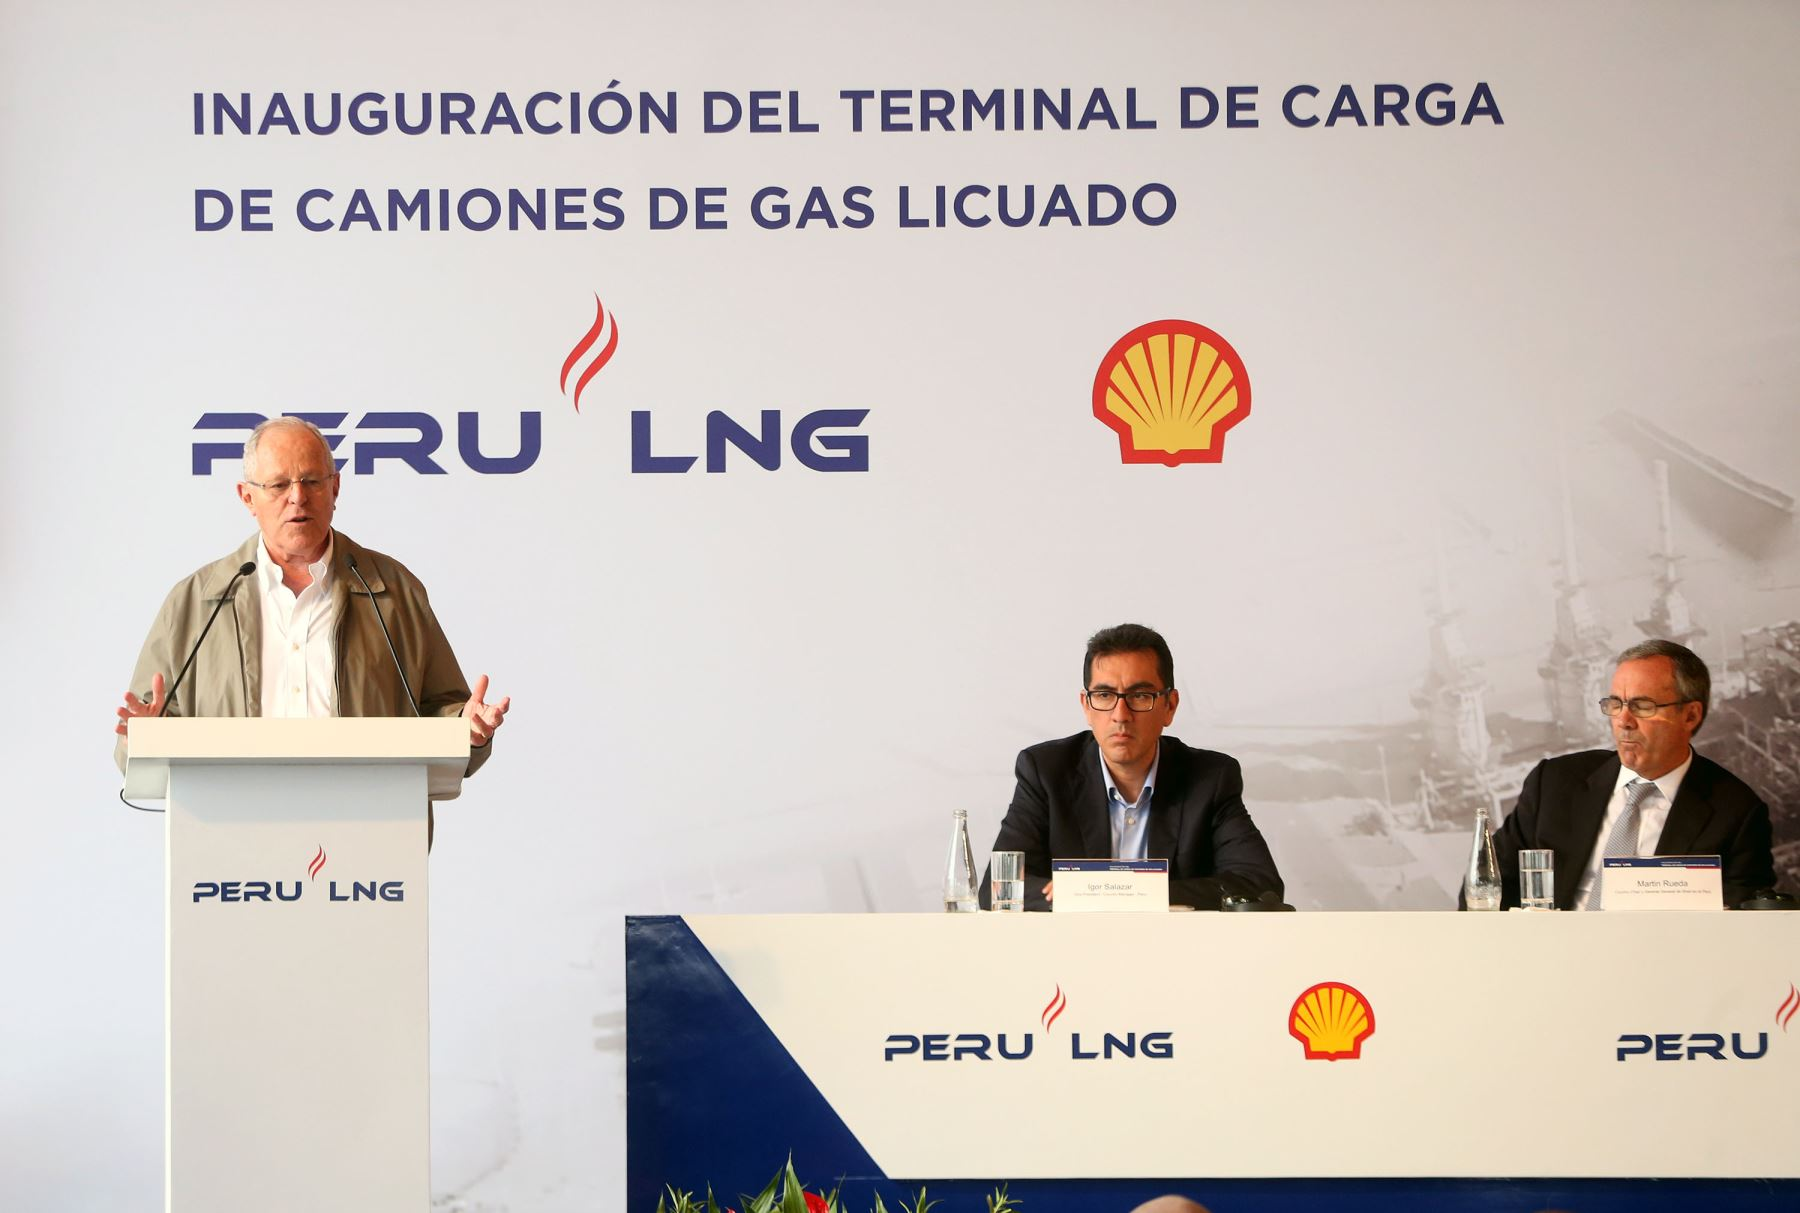 Kuczynski inaugura sistema de carga de camiones que for Portal del instalador de gas natural